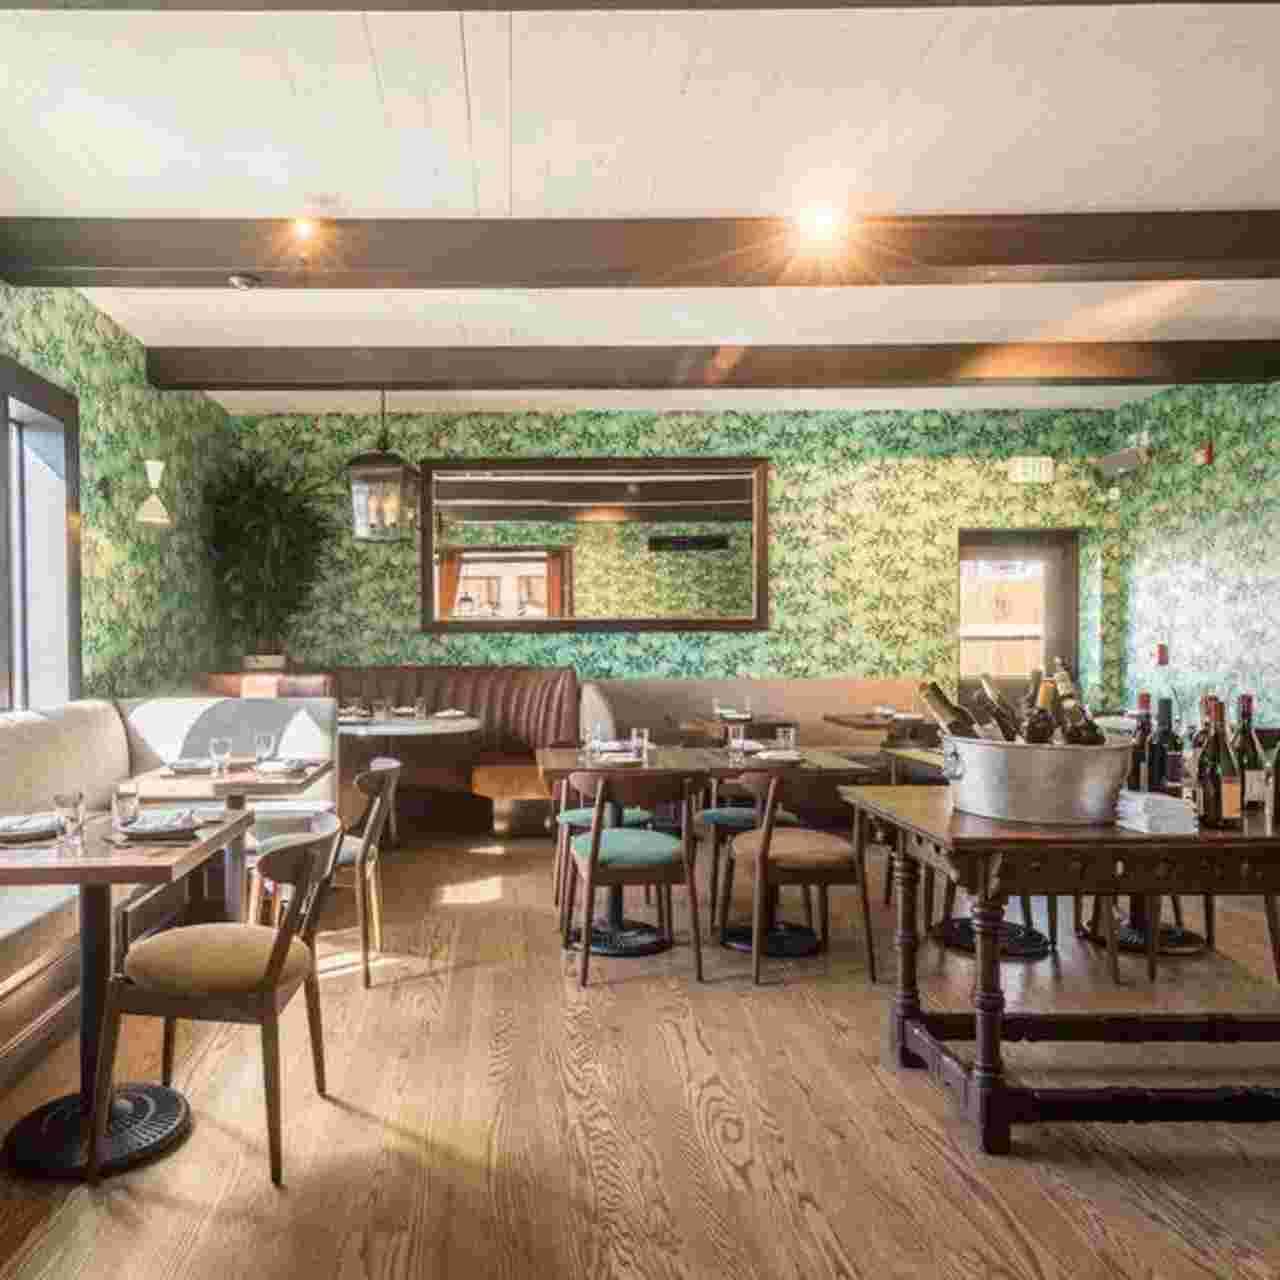 Felix Trattoria Named One of Eater's Best New Restaurants in America